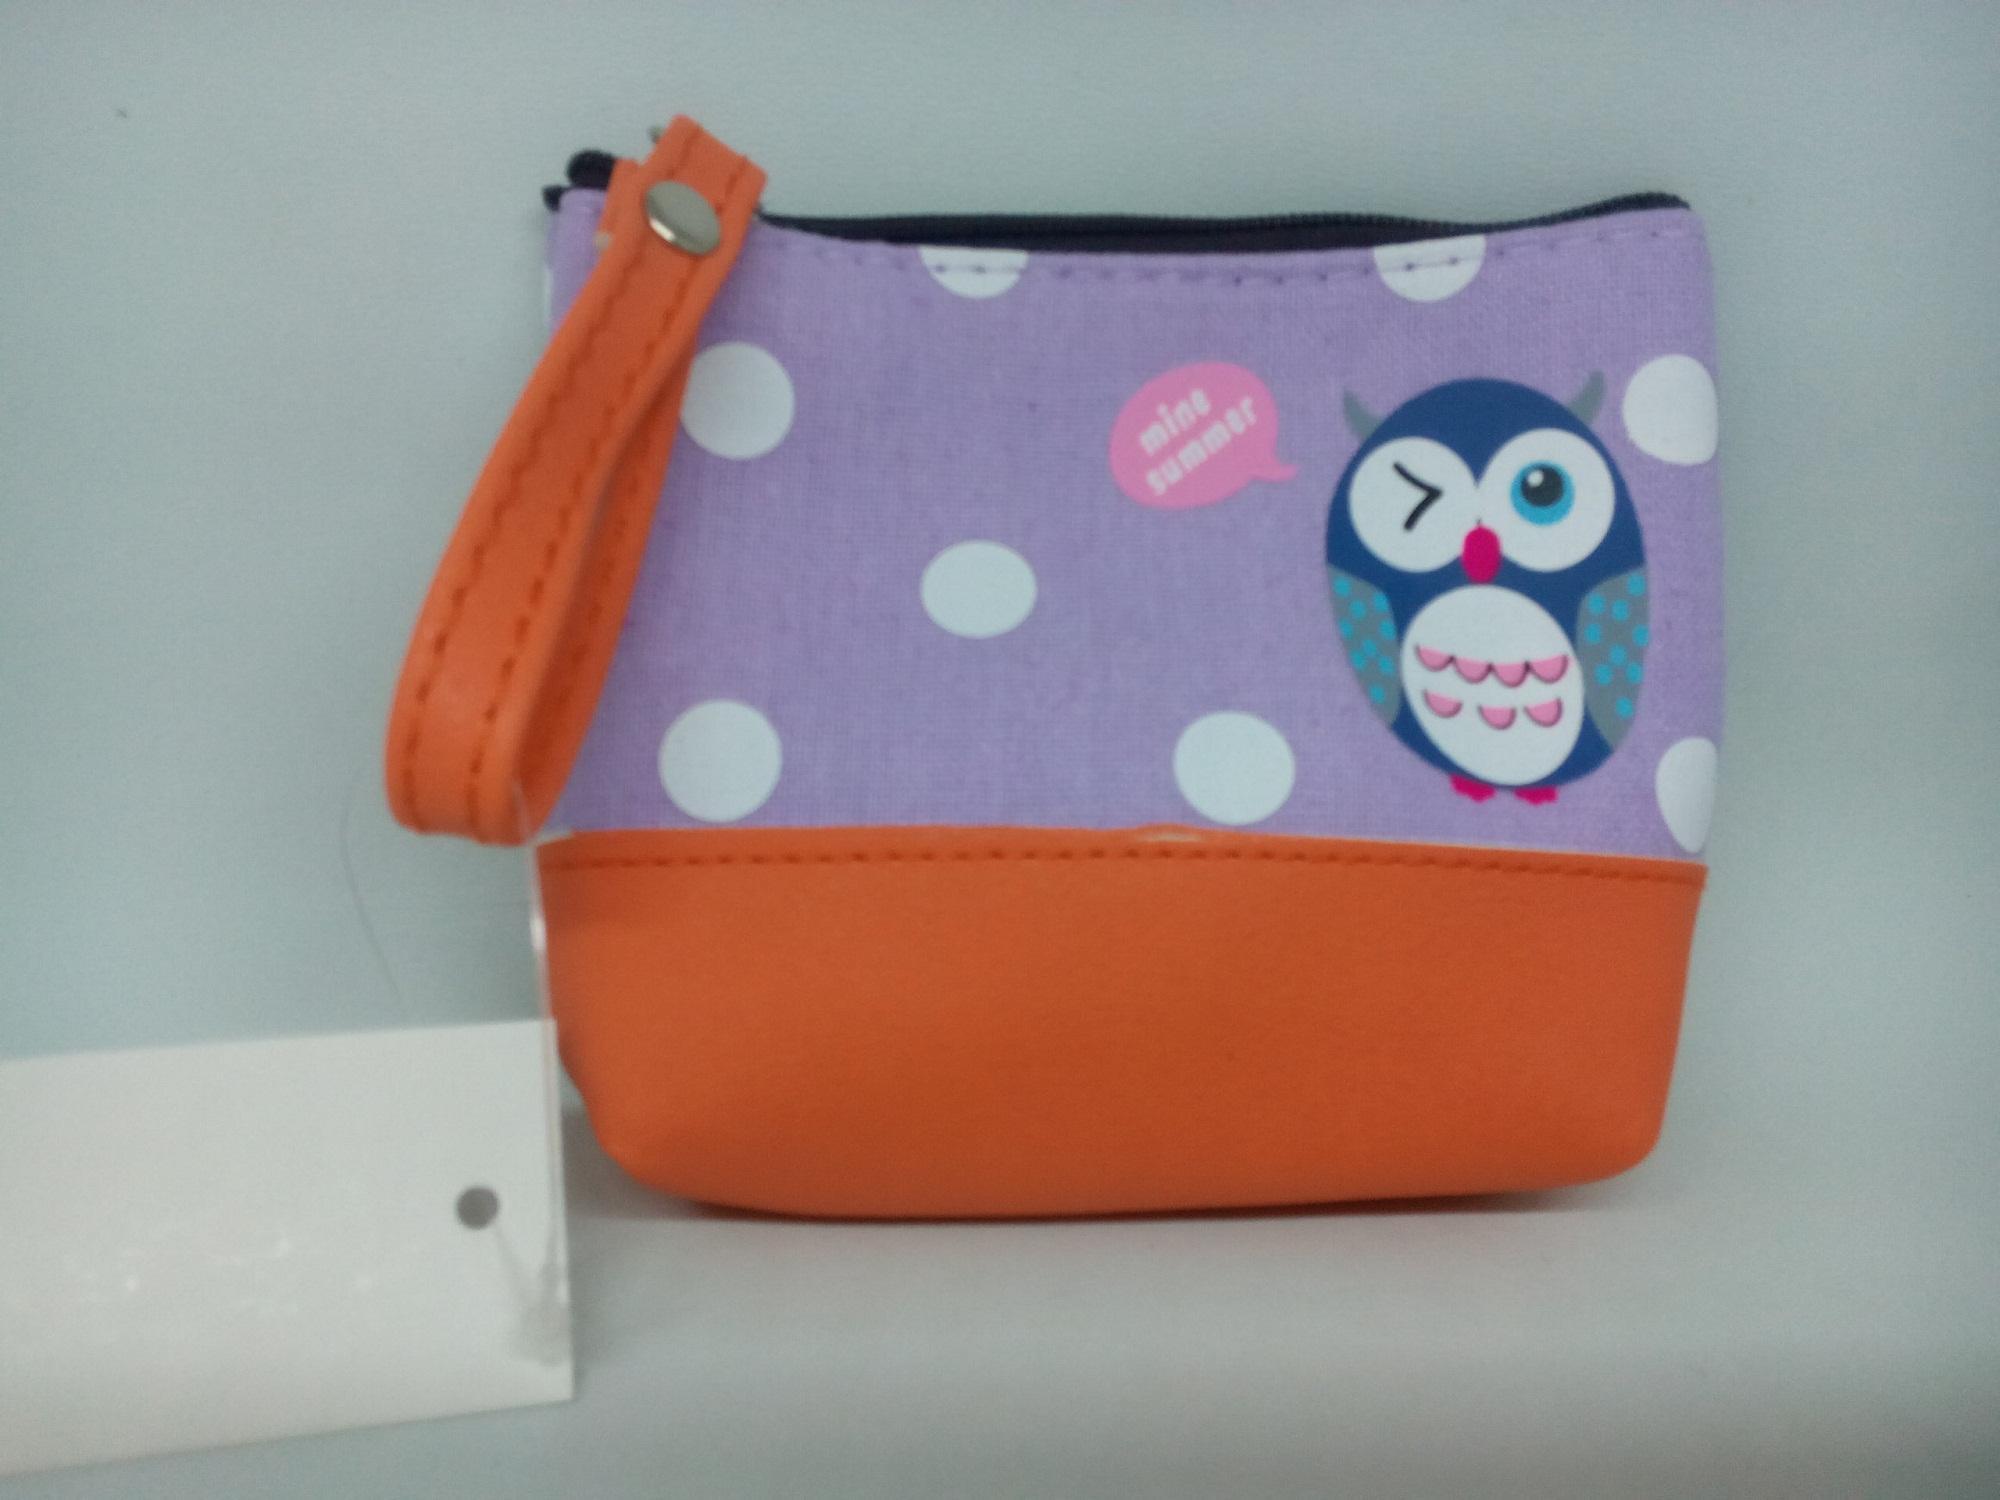 Dompet Koin dan Pouch Dompet Wanita / Dompet cewek murah import terbaru -clue win shop